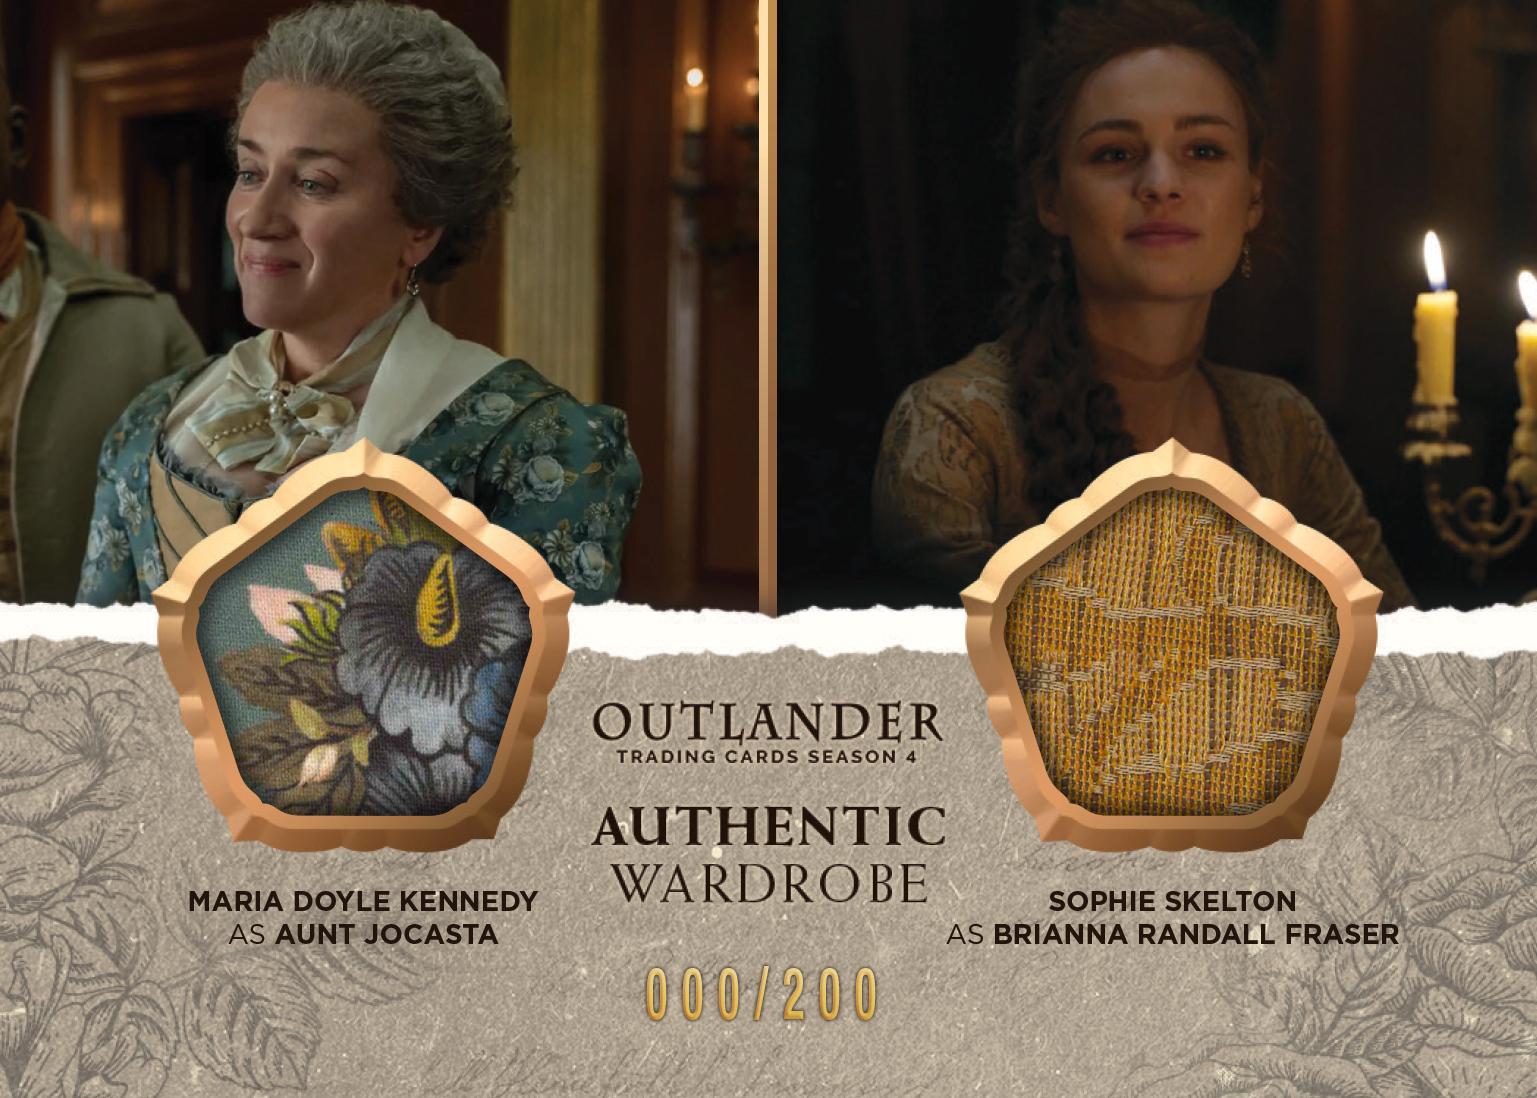 Outlander Trading Cards Season 4: Convention Wardrobe Card CE4 (Cryptozoic Con II Exclusive)